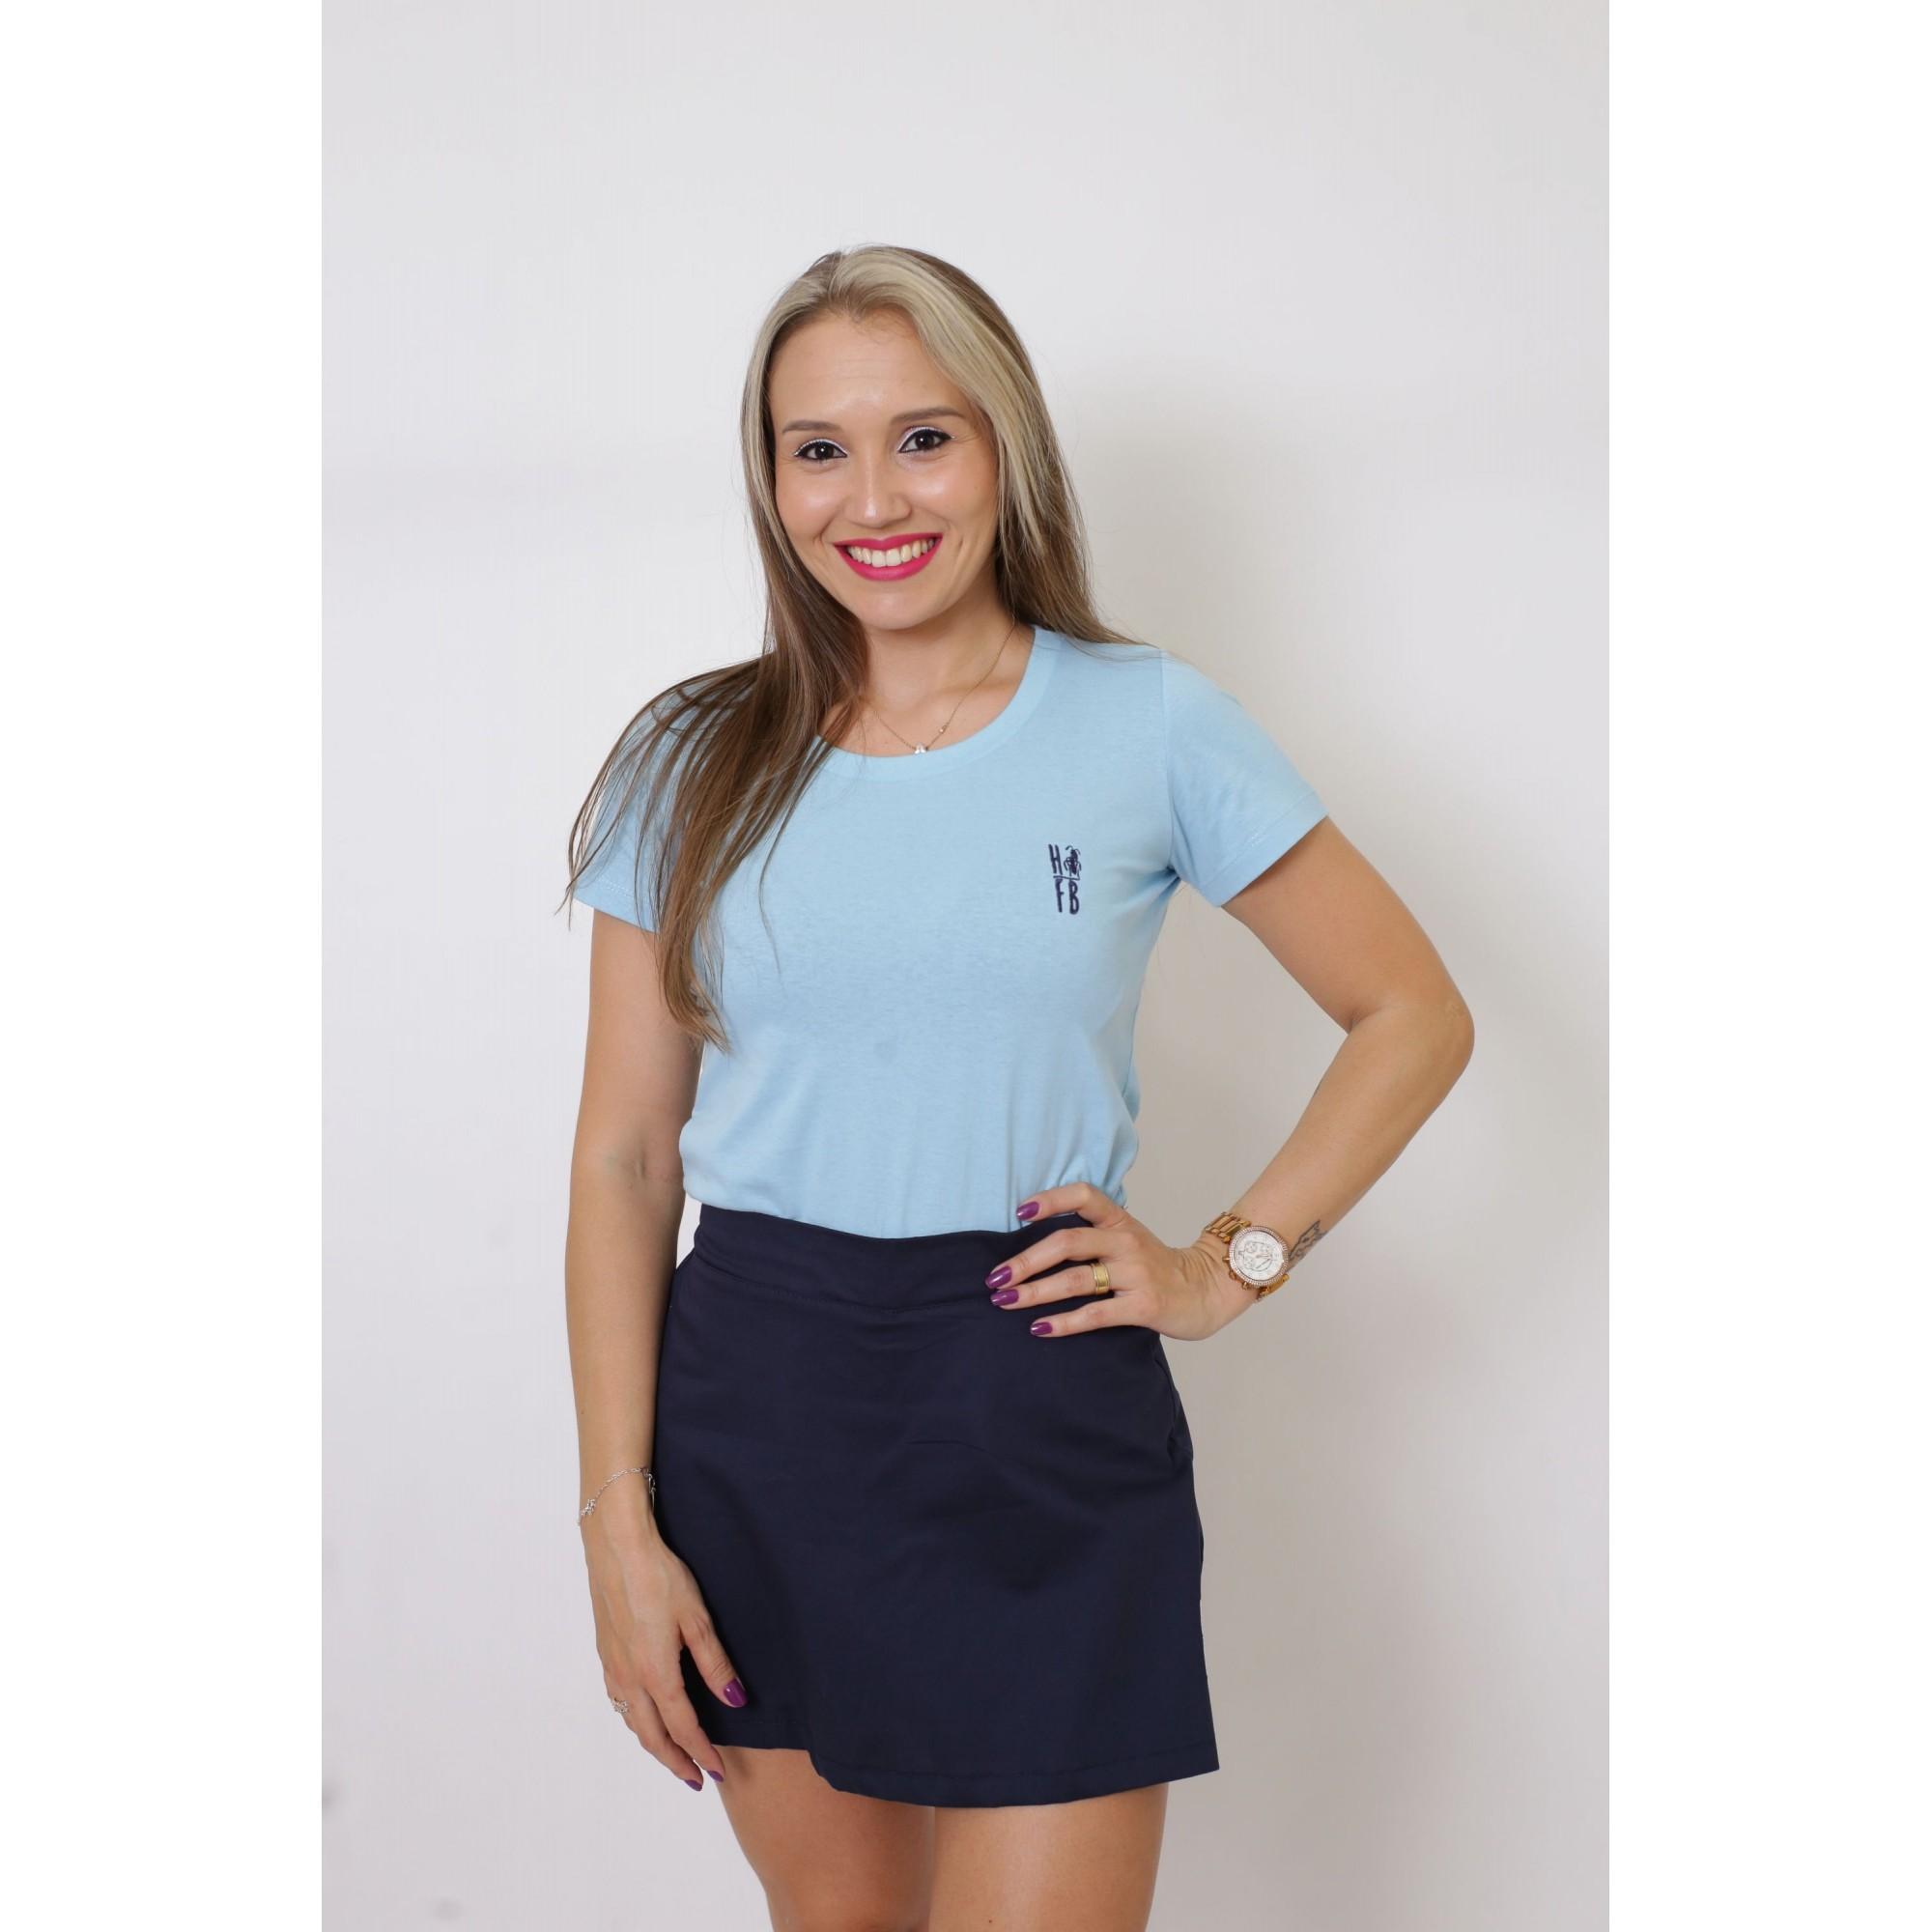 MÃE E FILHA > Kit 02 Peças T-Shirts - Azul Bebê [Coleção Tal Mãe Tal Filha]  - Heitor Fashion Brazil